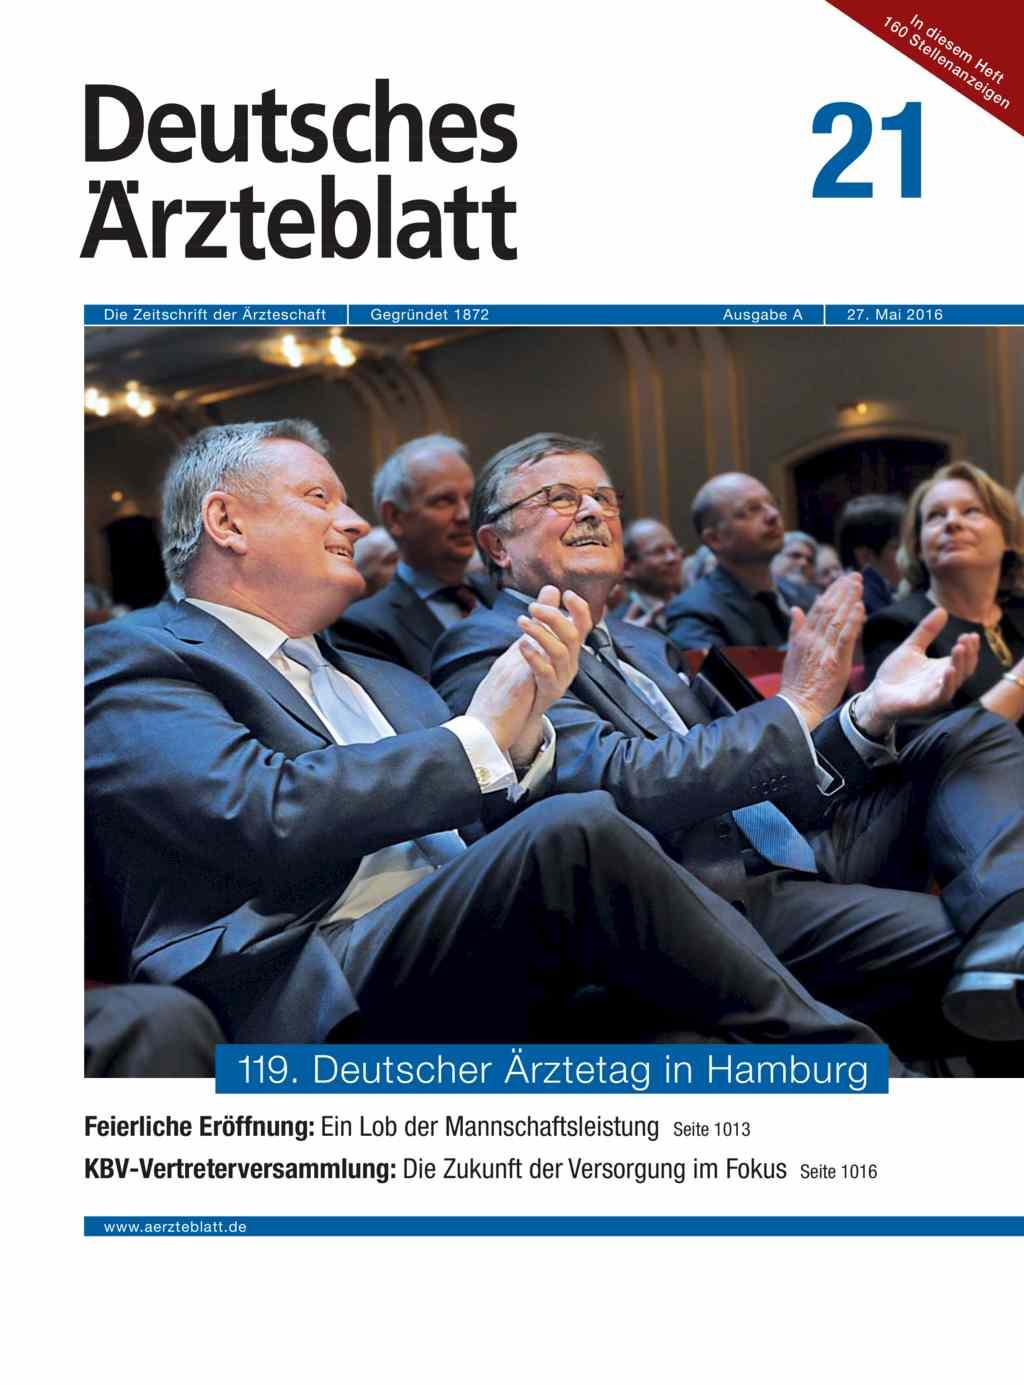 Deutsches Ärzteblatt: Können Kartoffeln den Blutdruck..